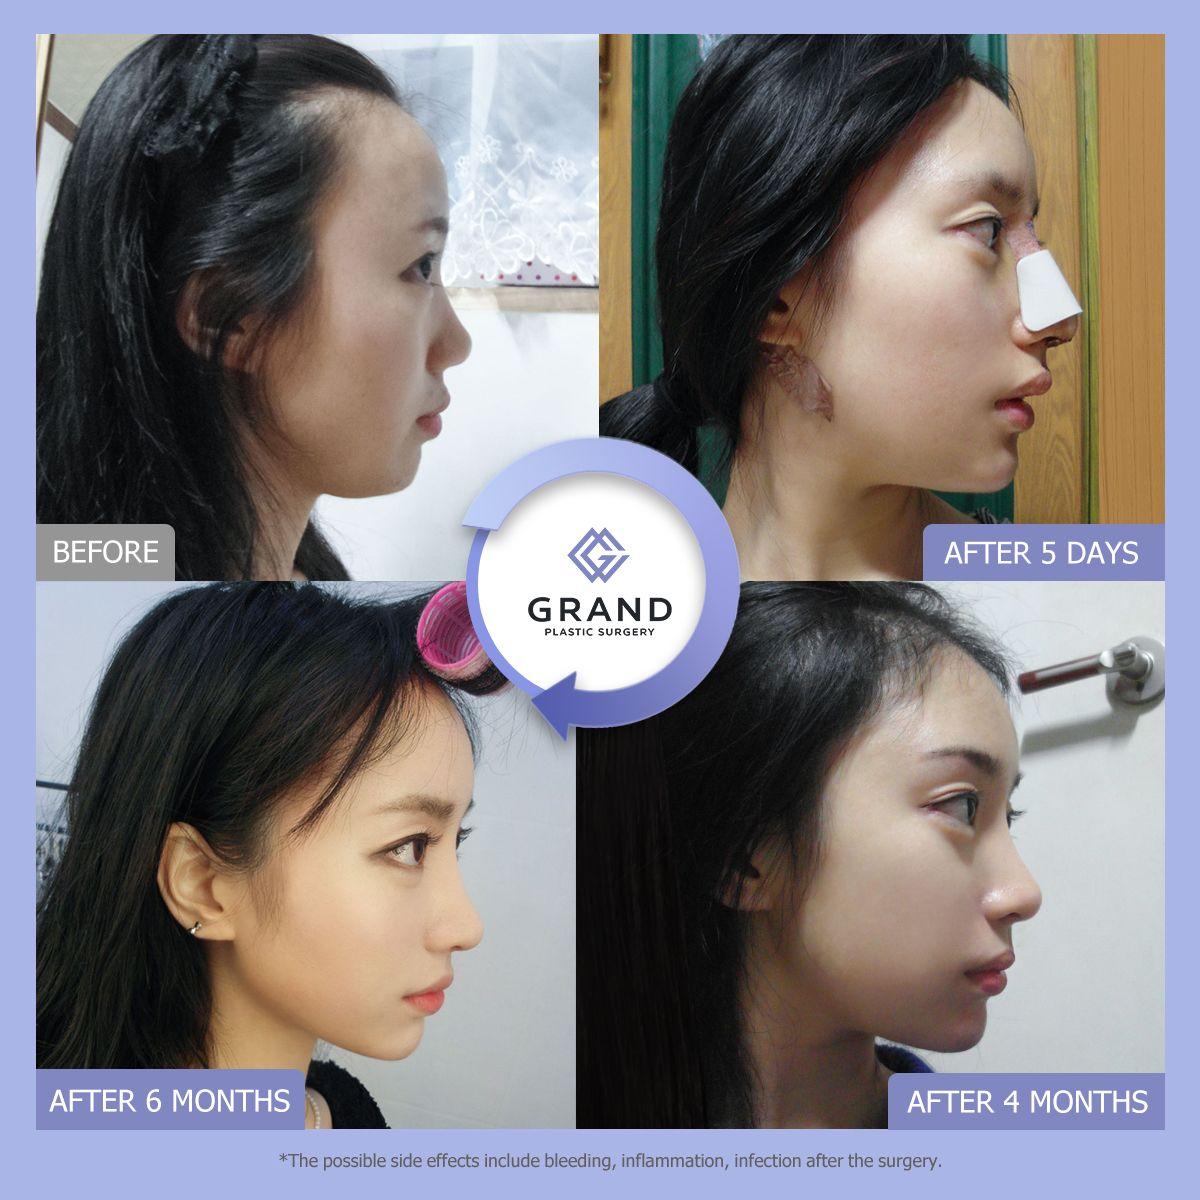 Pin by Telma on GRAND Plastic surgery, Rhinoplasty, Surgery